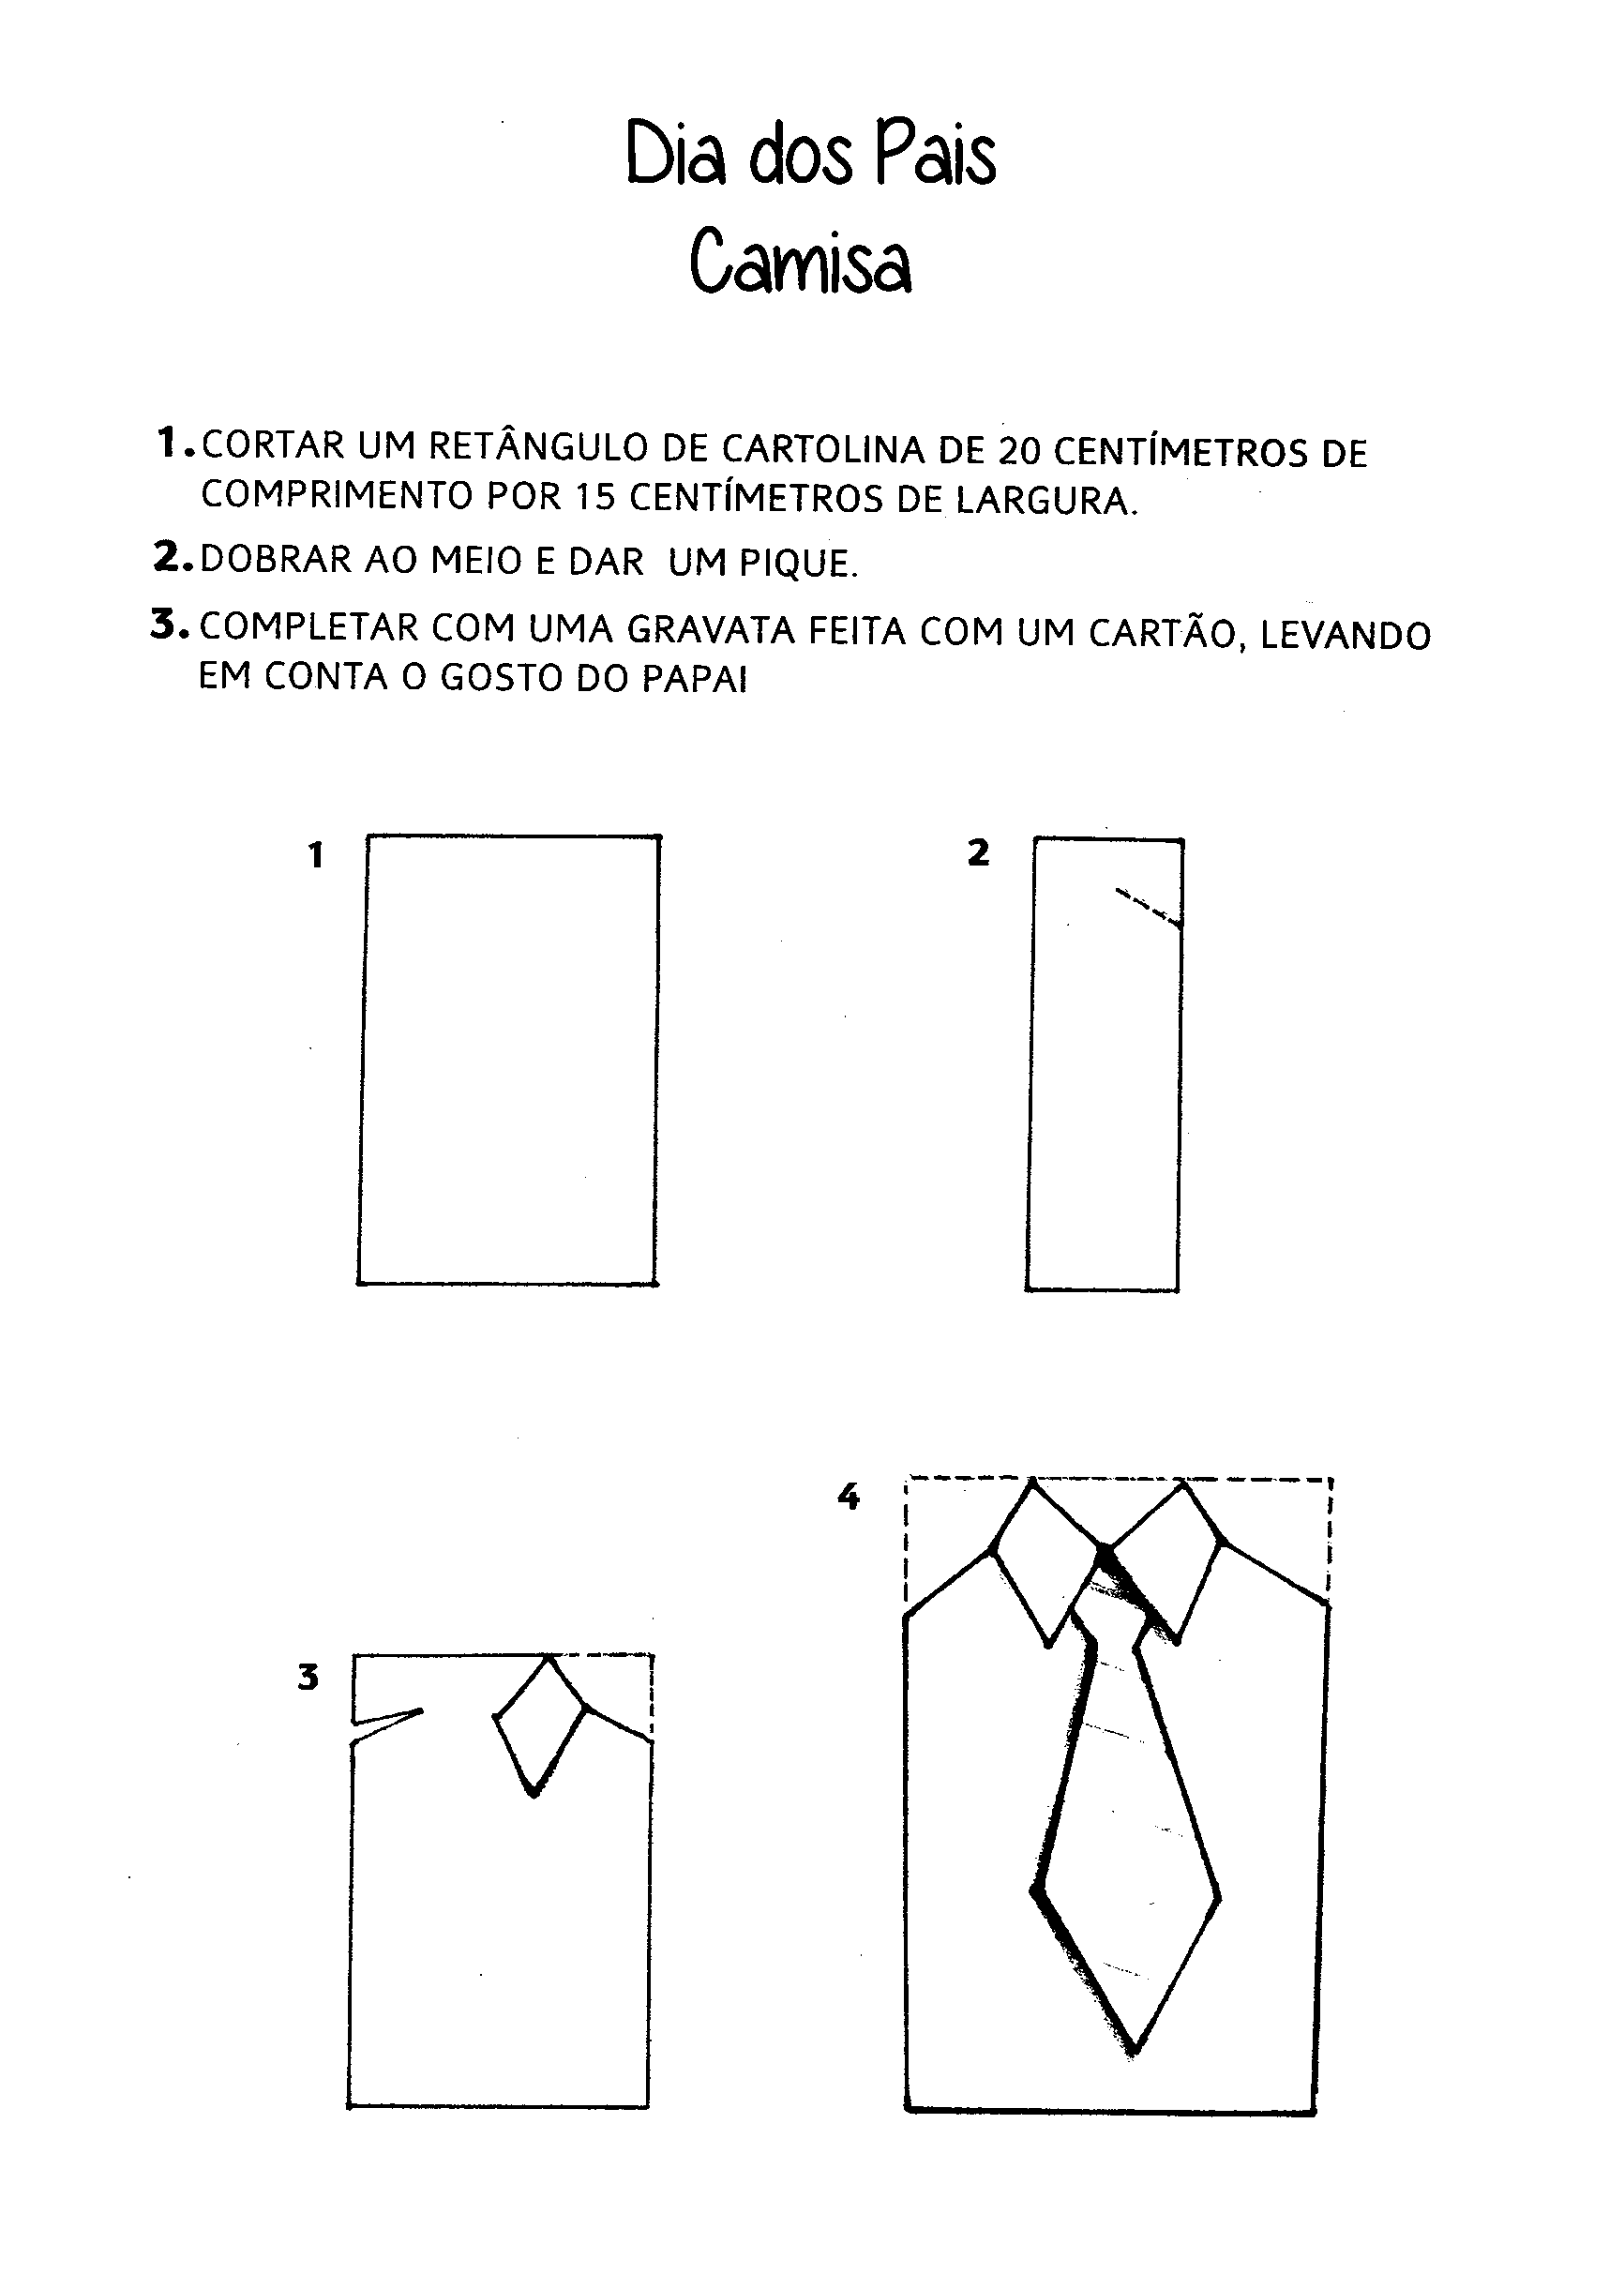 0219-dia-pais-camisa